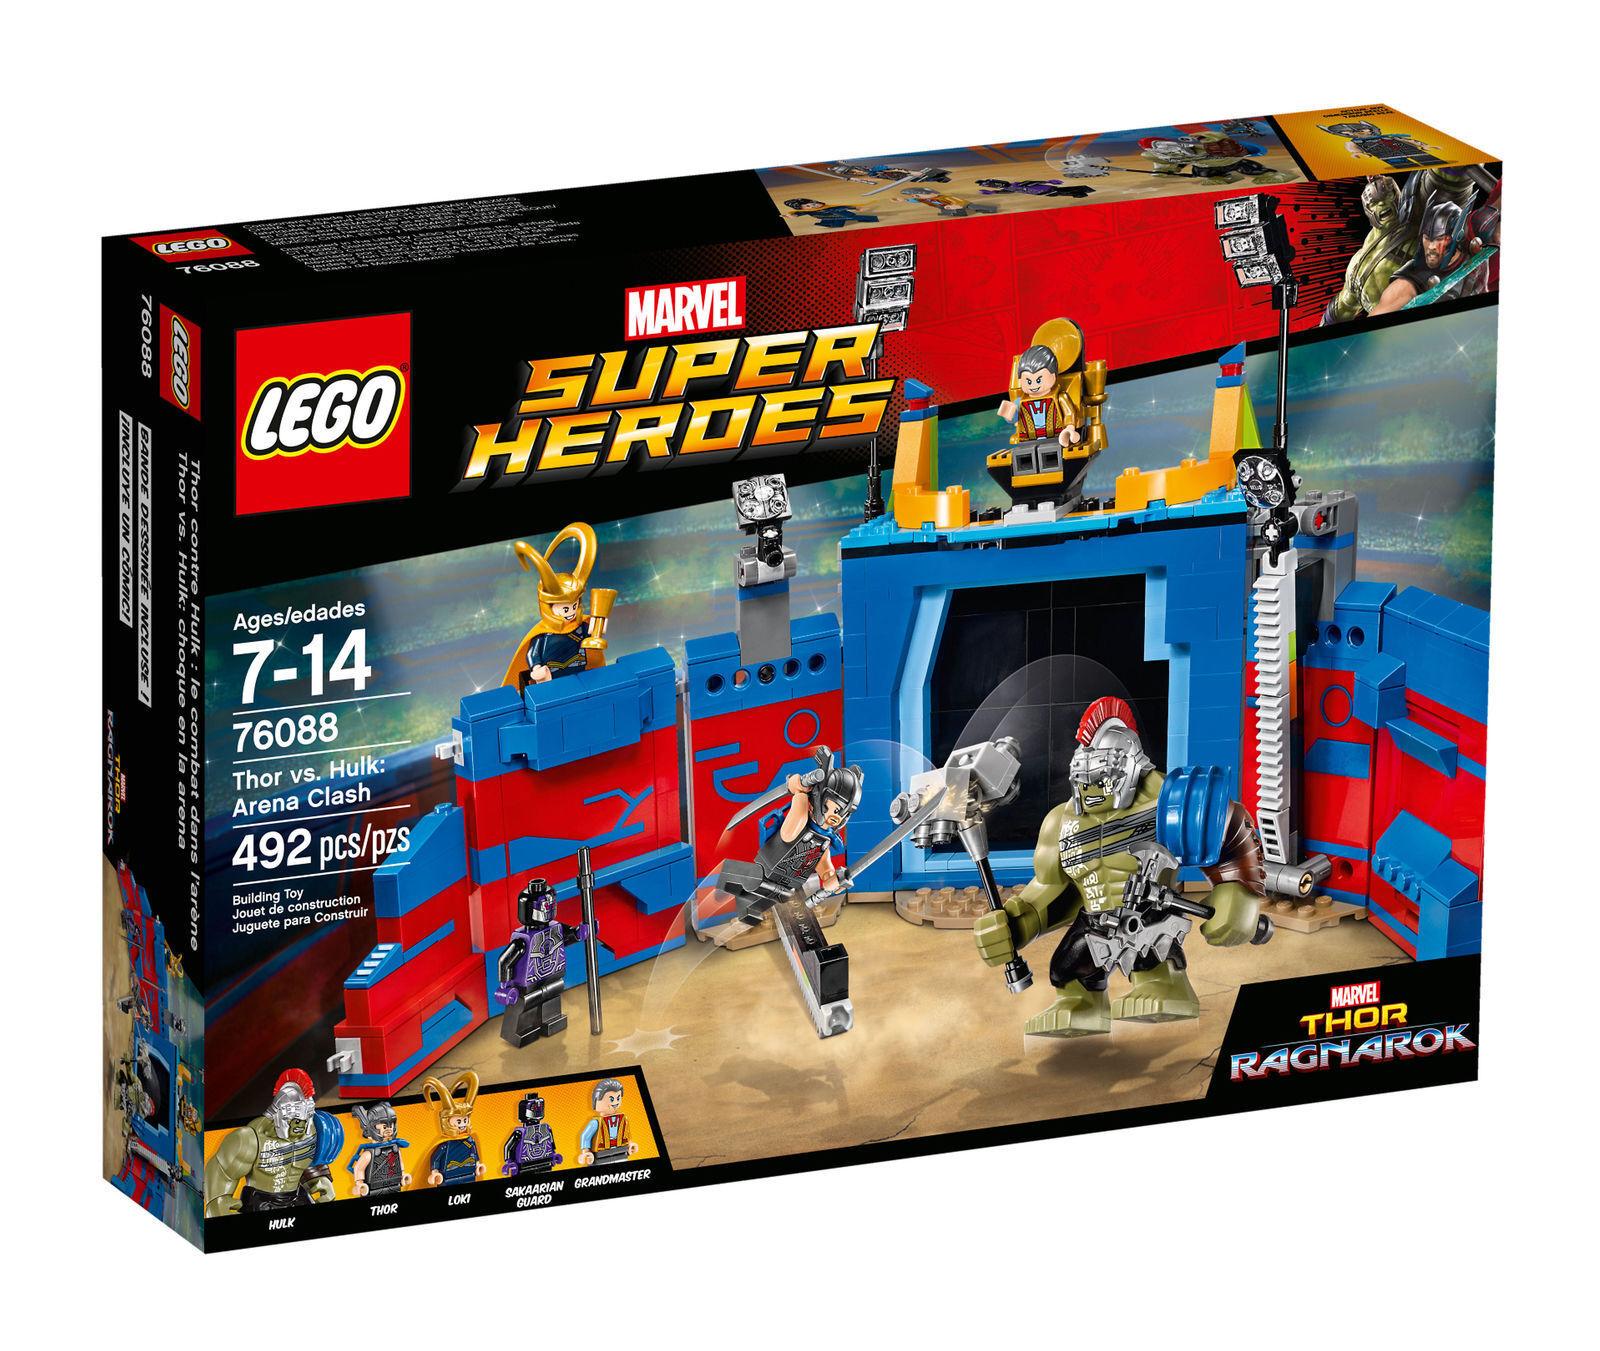 Nuovo LEGO Marvel Super Heroes Thor vs. Hulk Arena Clash 76088 - fast ship insurosso